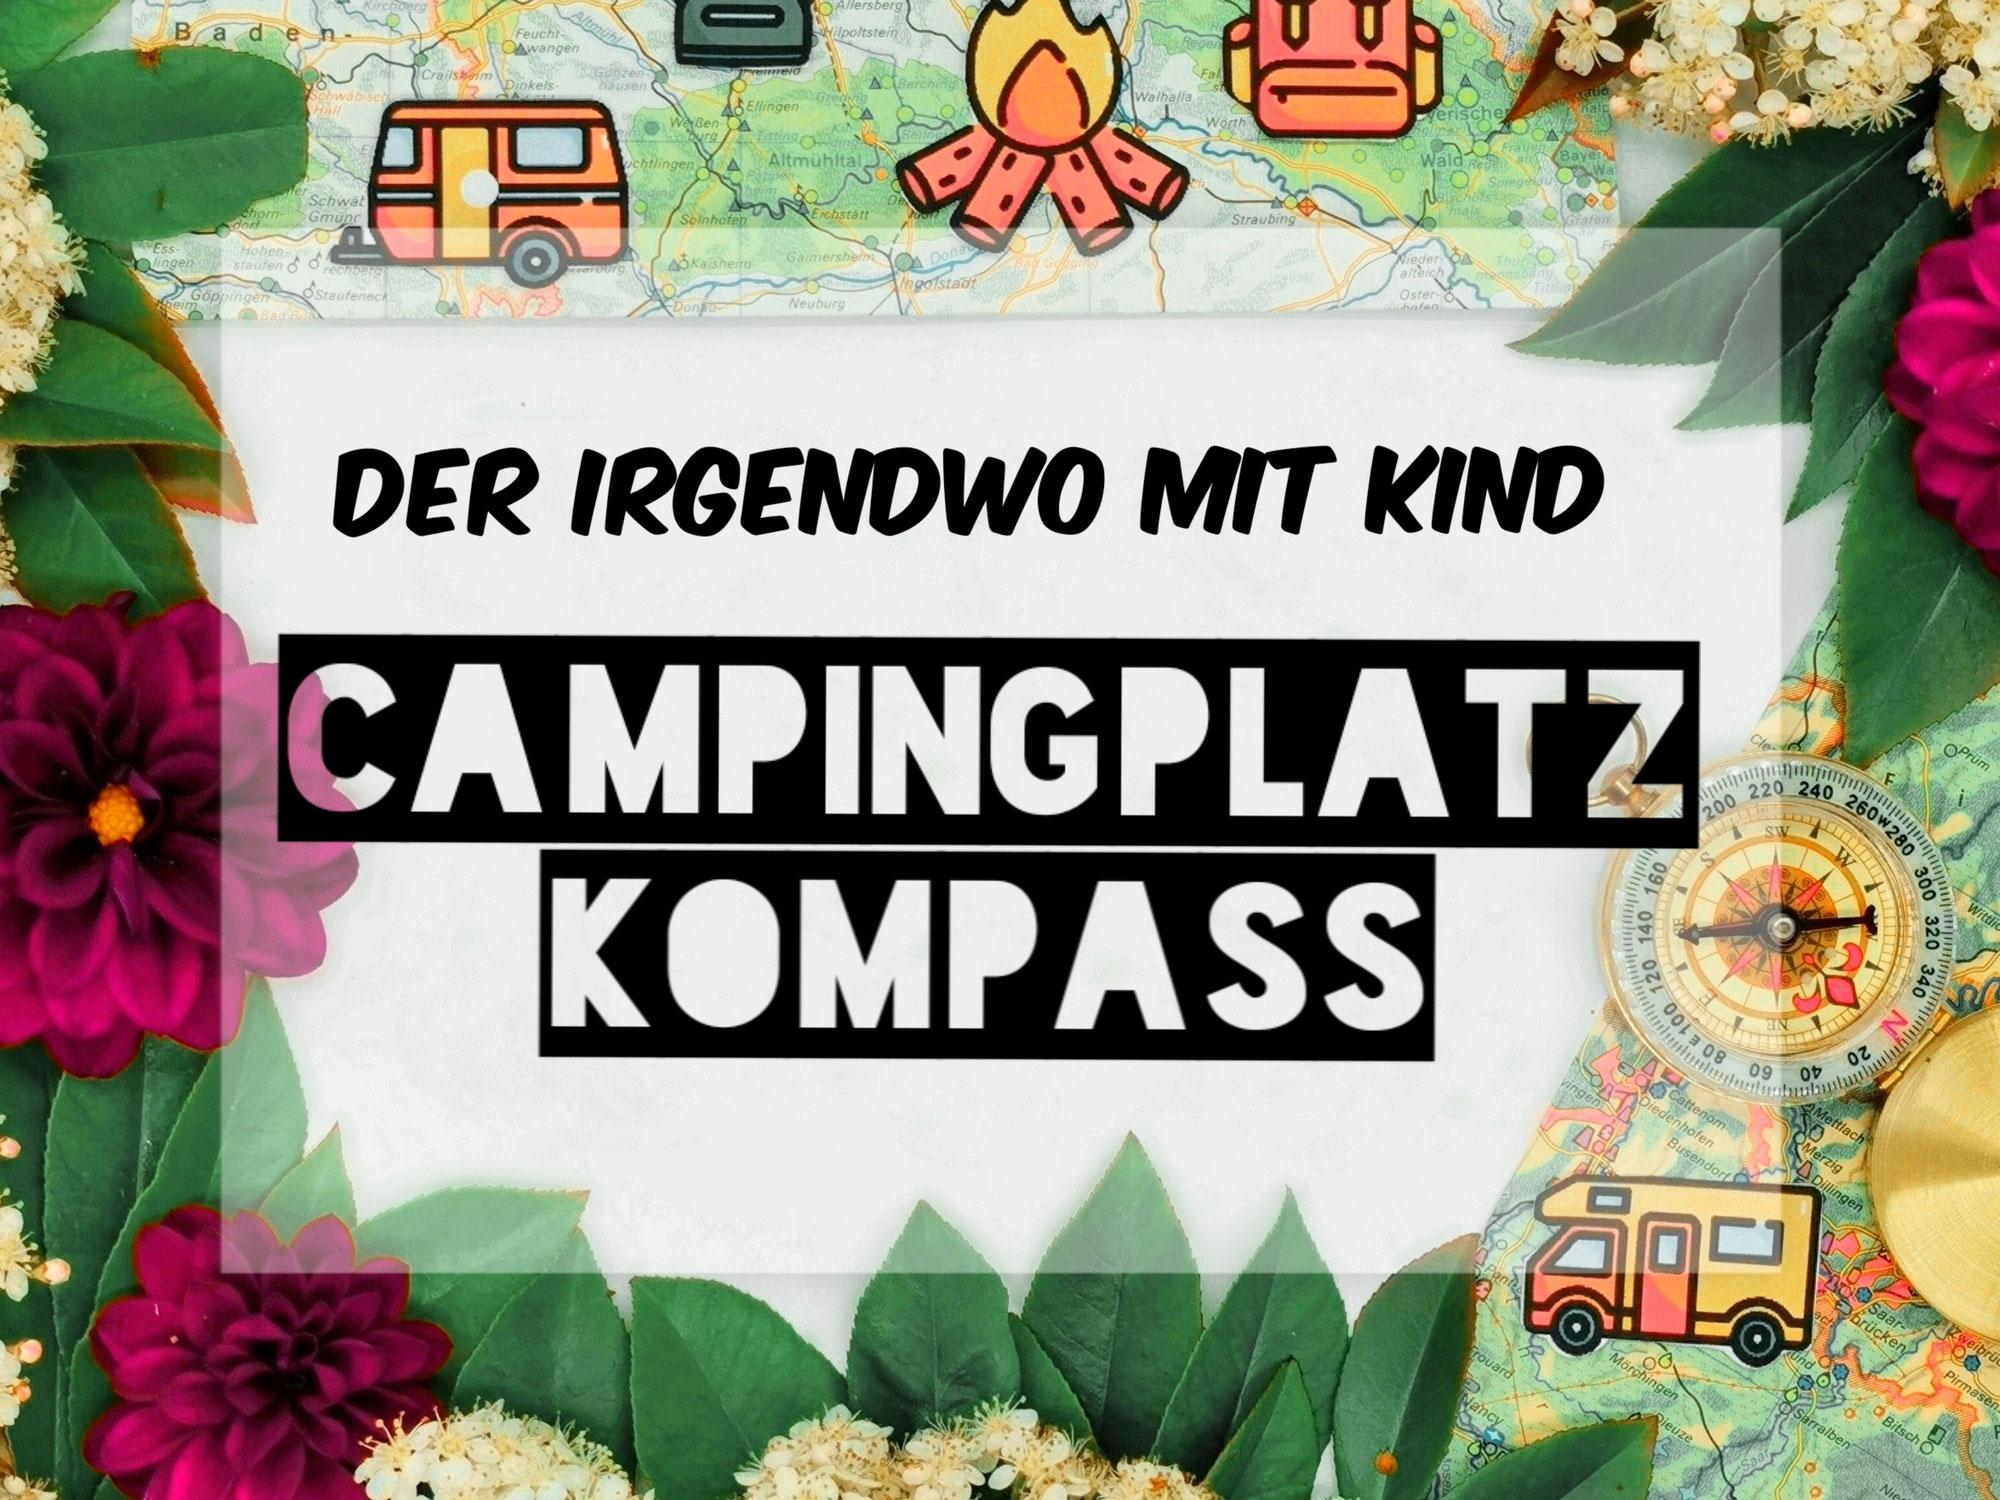 Campingplatz Kompass - wir testen Campingplätze für Kinder